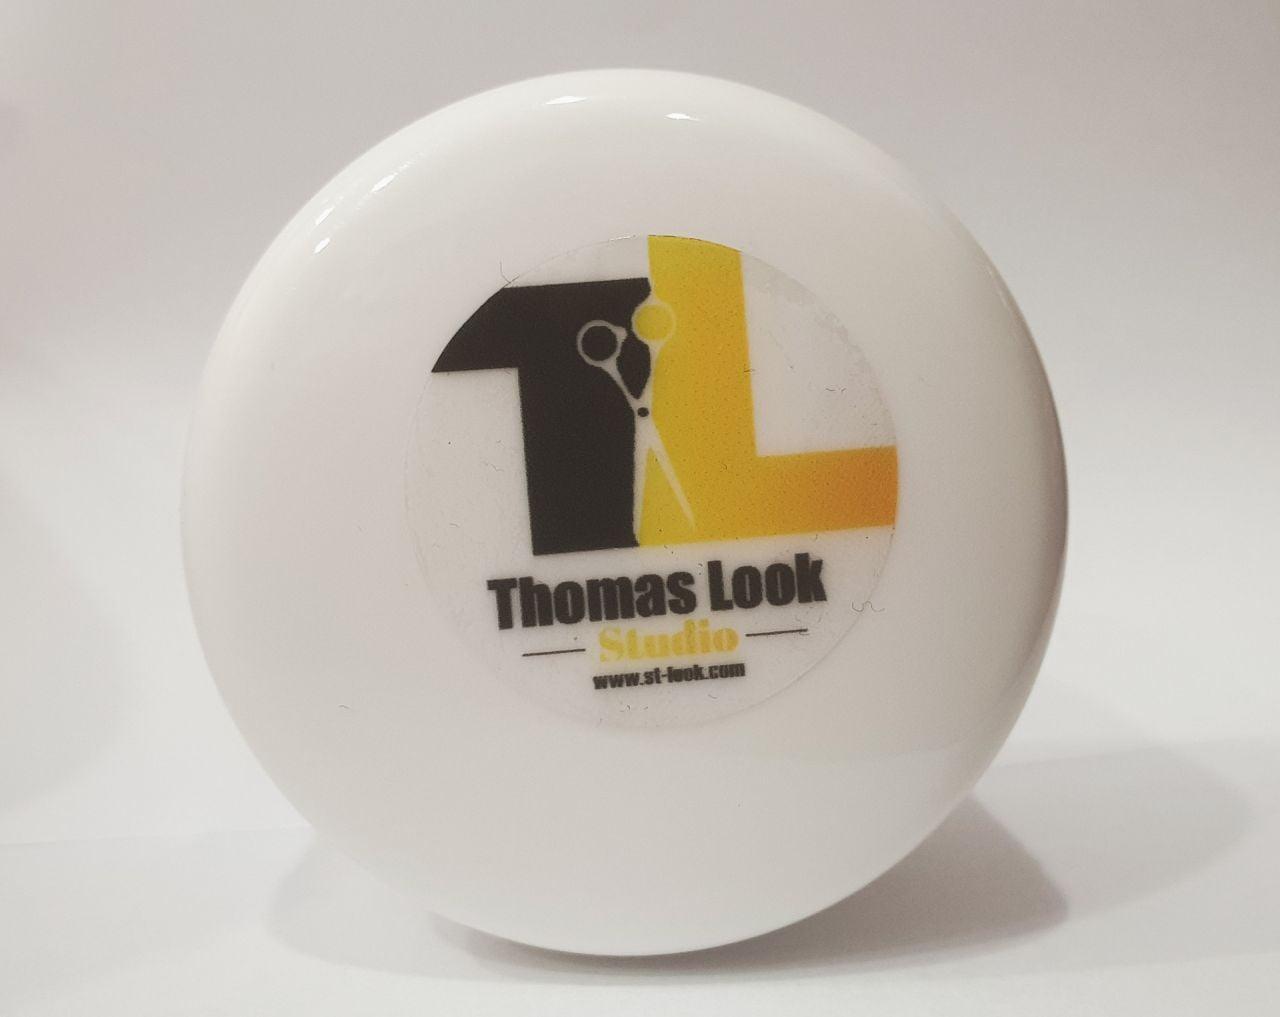 naklejki z logo Thomas Look